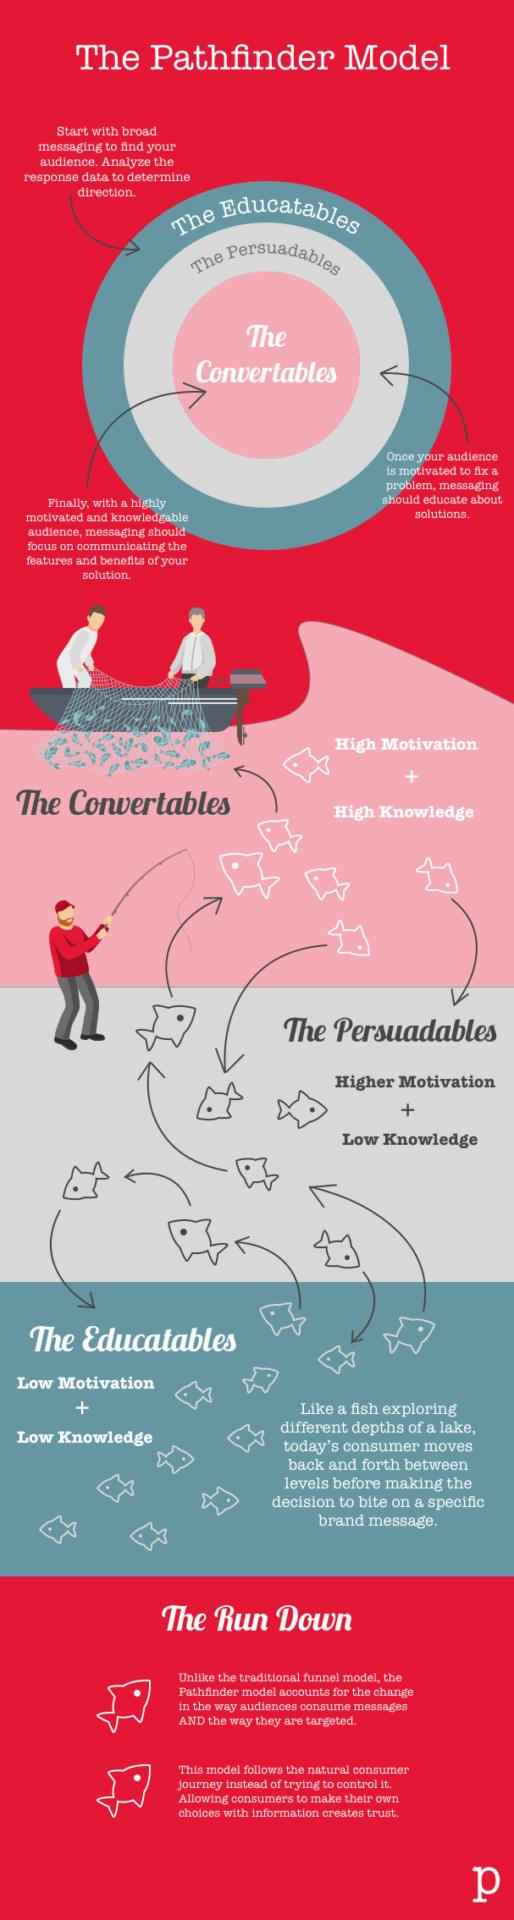 Pathfinder Model Infographic